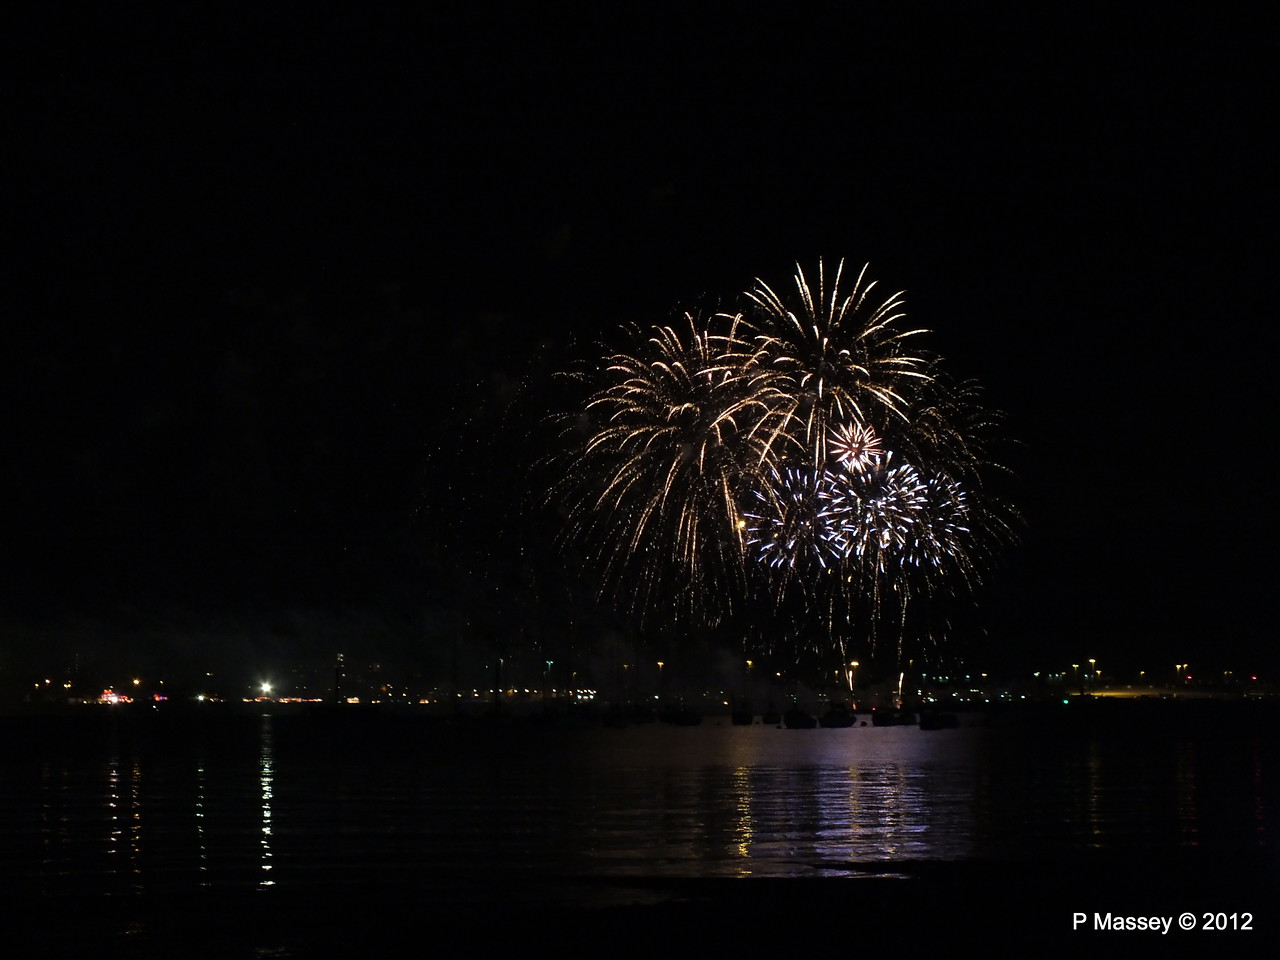 Fireworks off Mayflower Park PDM 03-11-2012 20-55-40